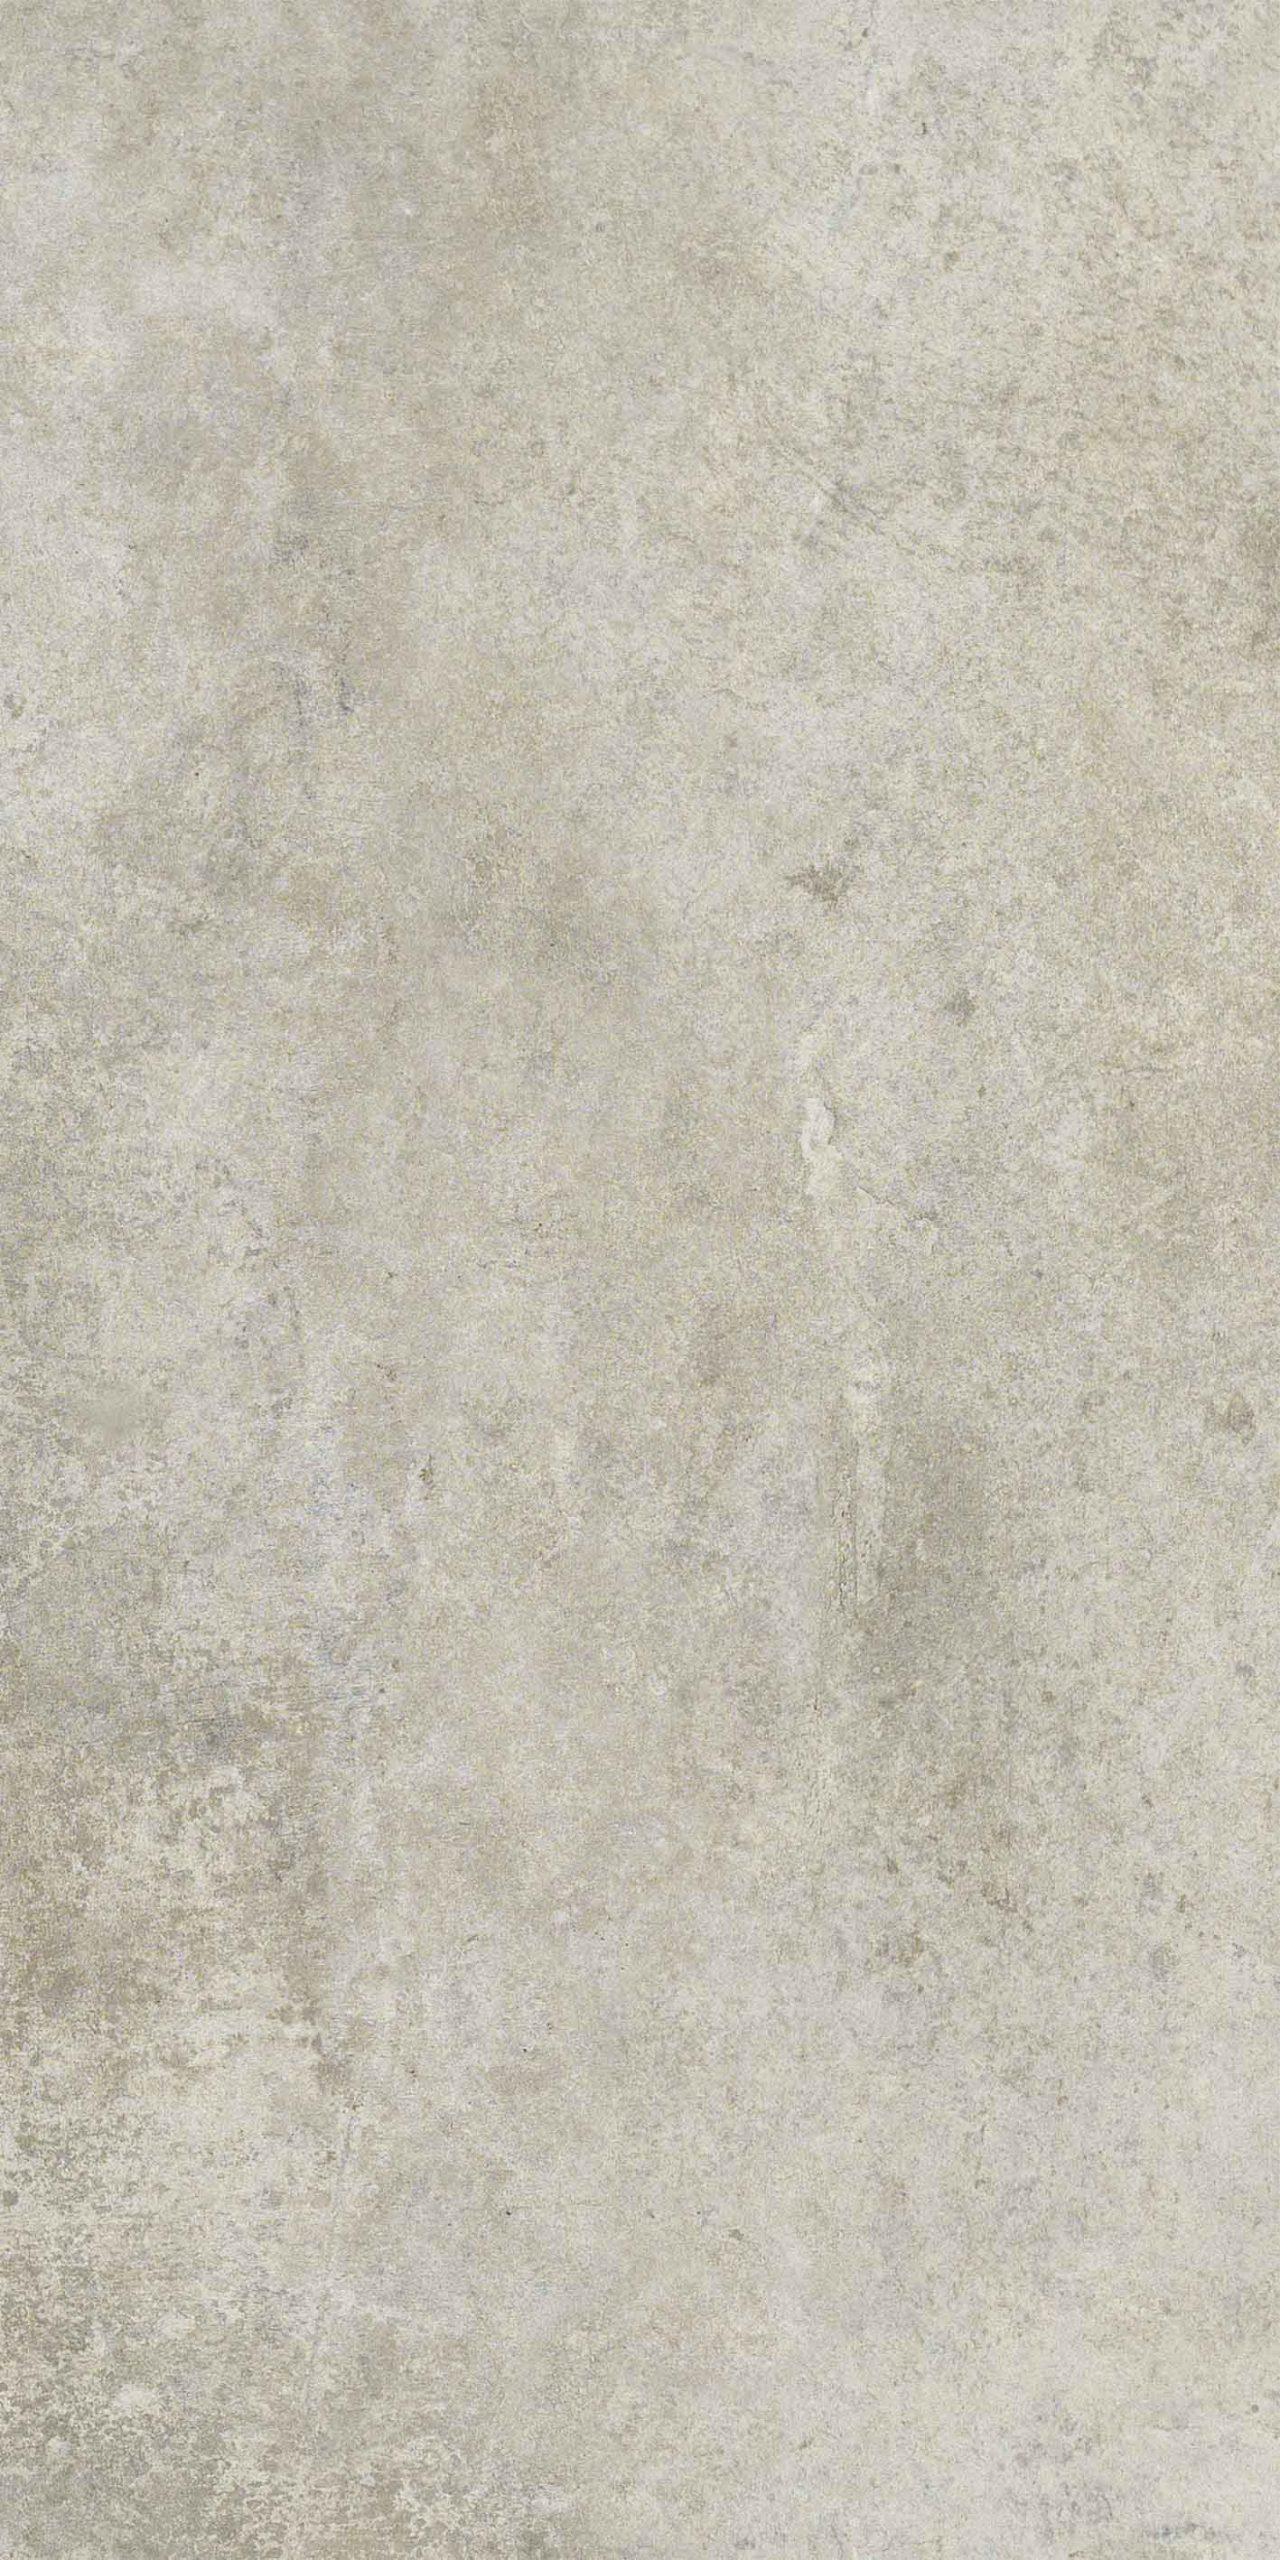 Artifact Worn Sand Matte 10mm 60 x 120